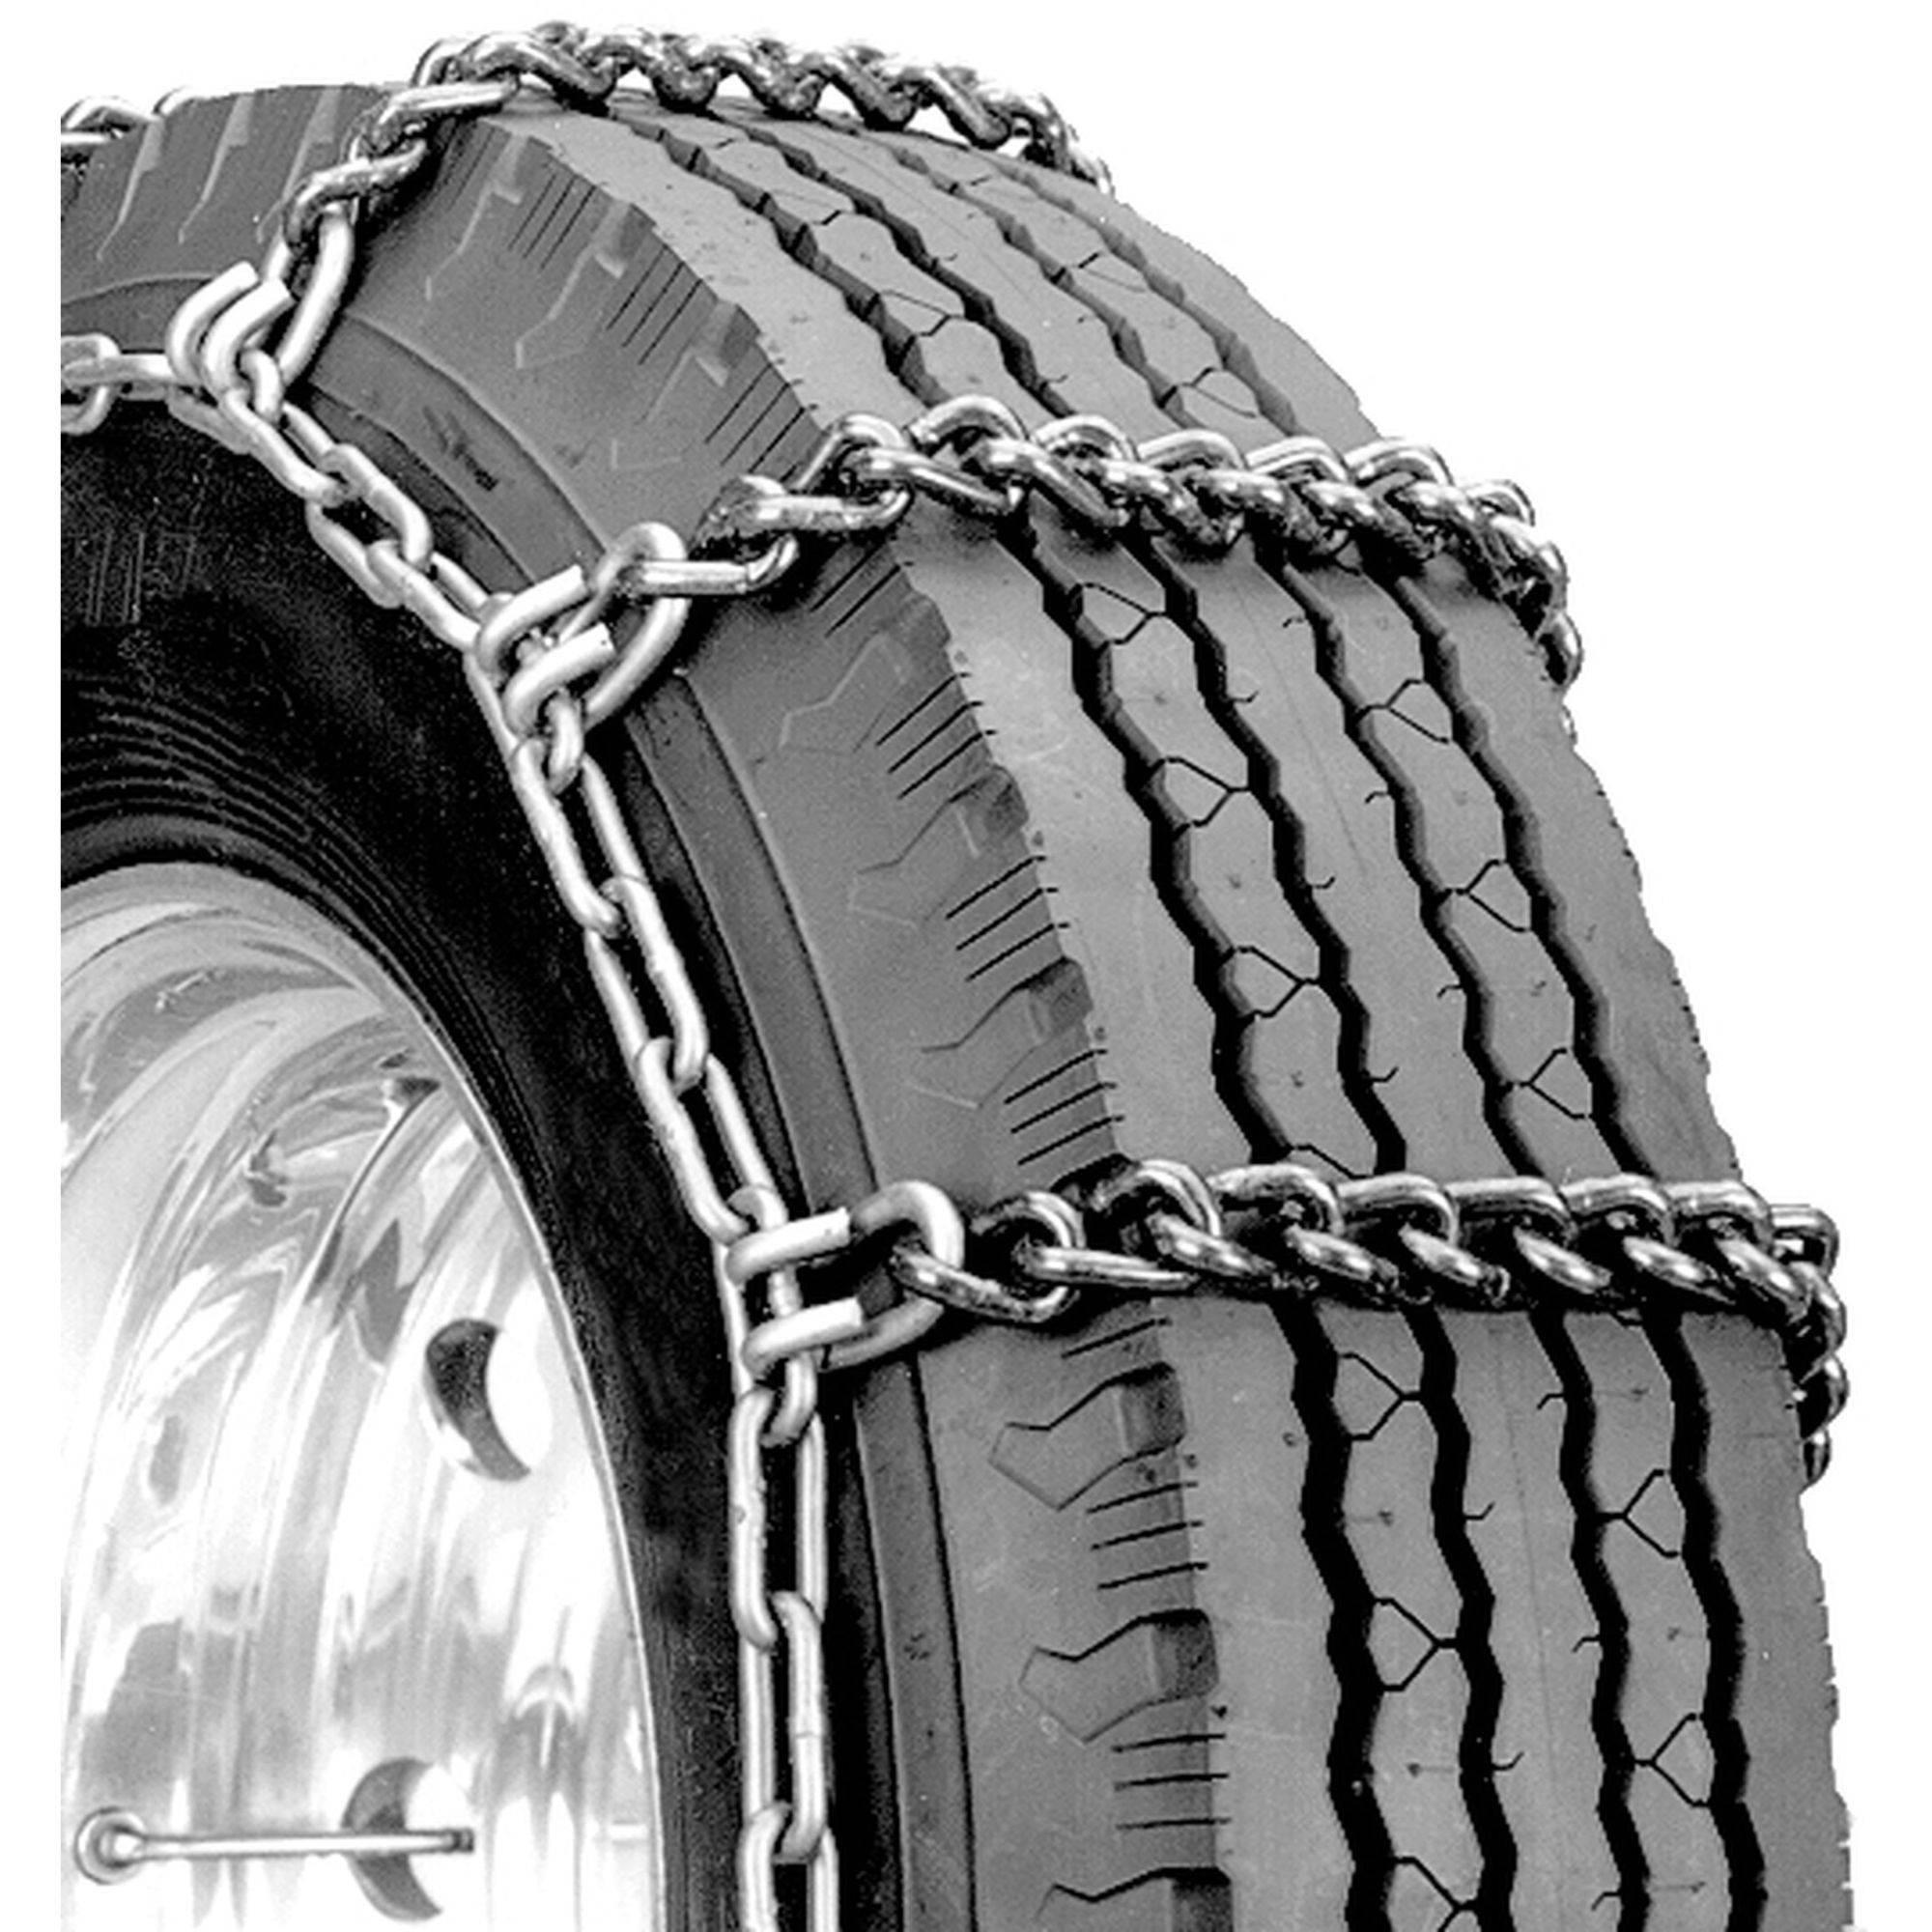 Heavy Duty Truck Tire Chains - Walmart.com